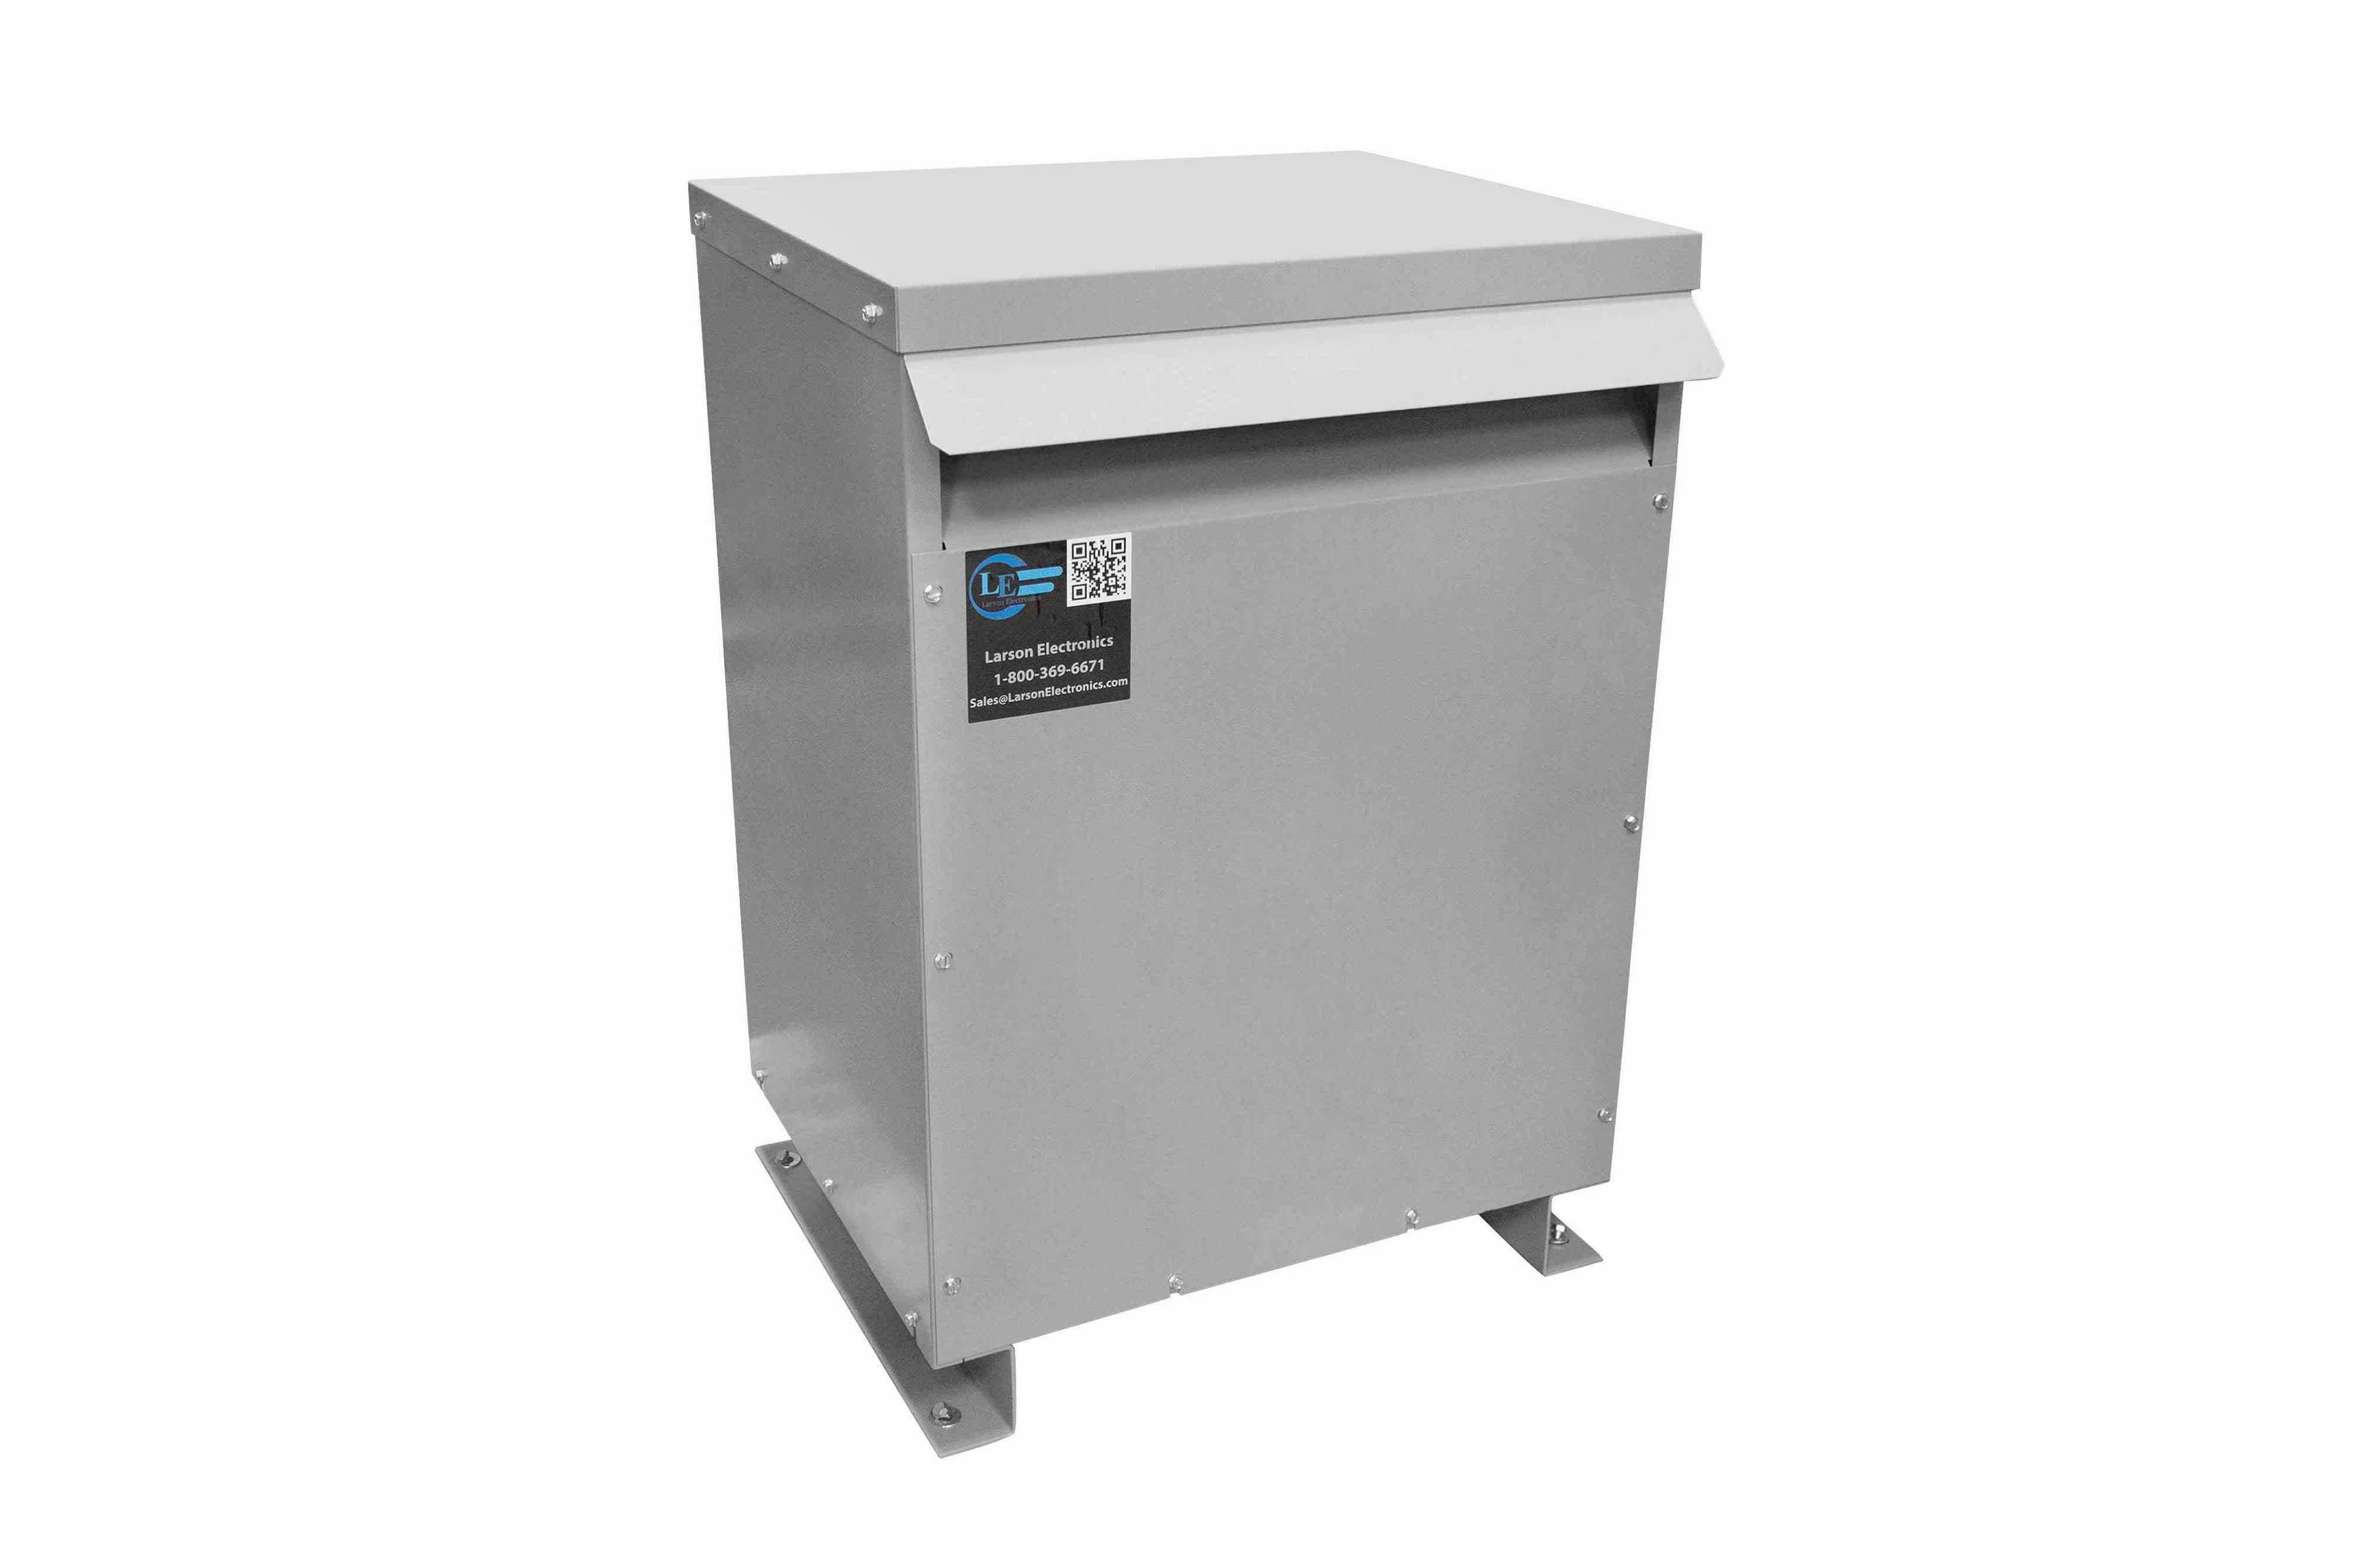 55 kVA 3PH Isolation Transformer, 380V Wye Primary, 480V Delta Secondary, N3R, Ventilated, 60 Hz